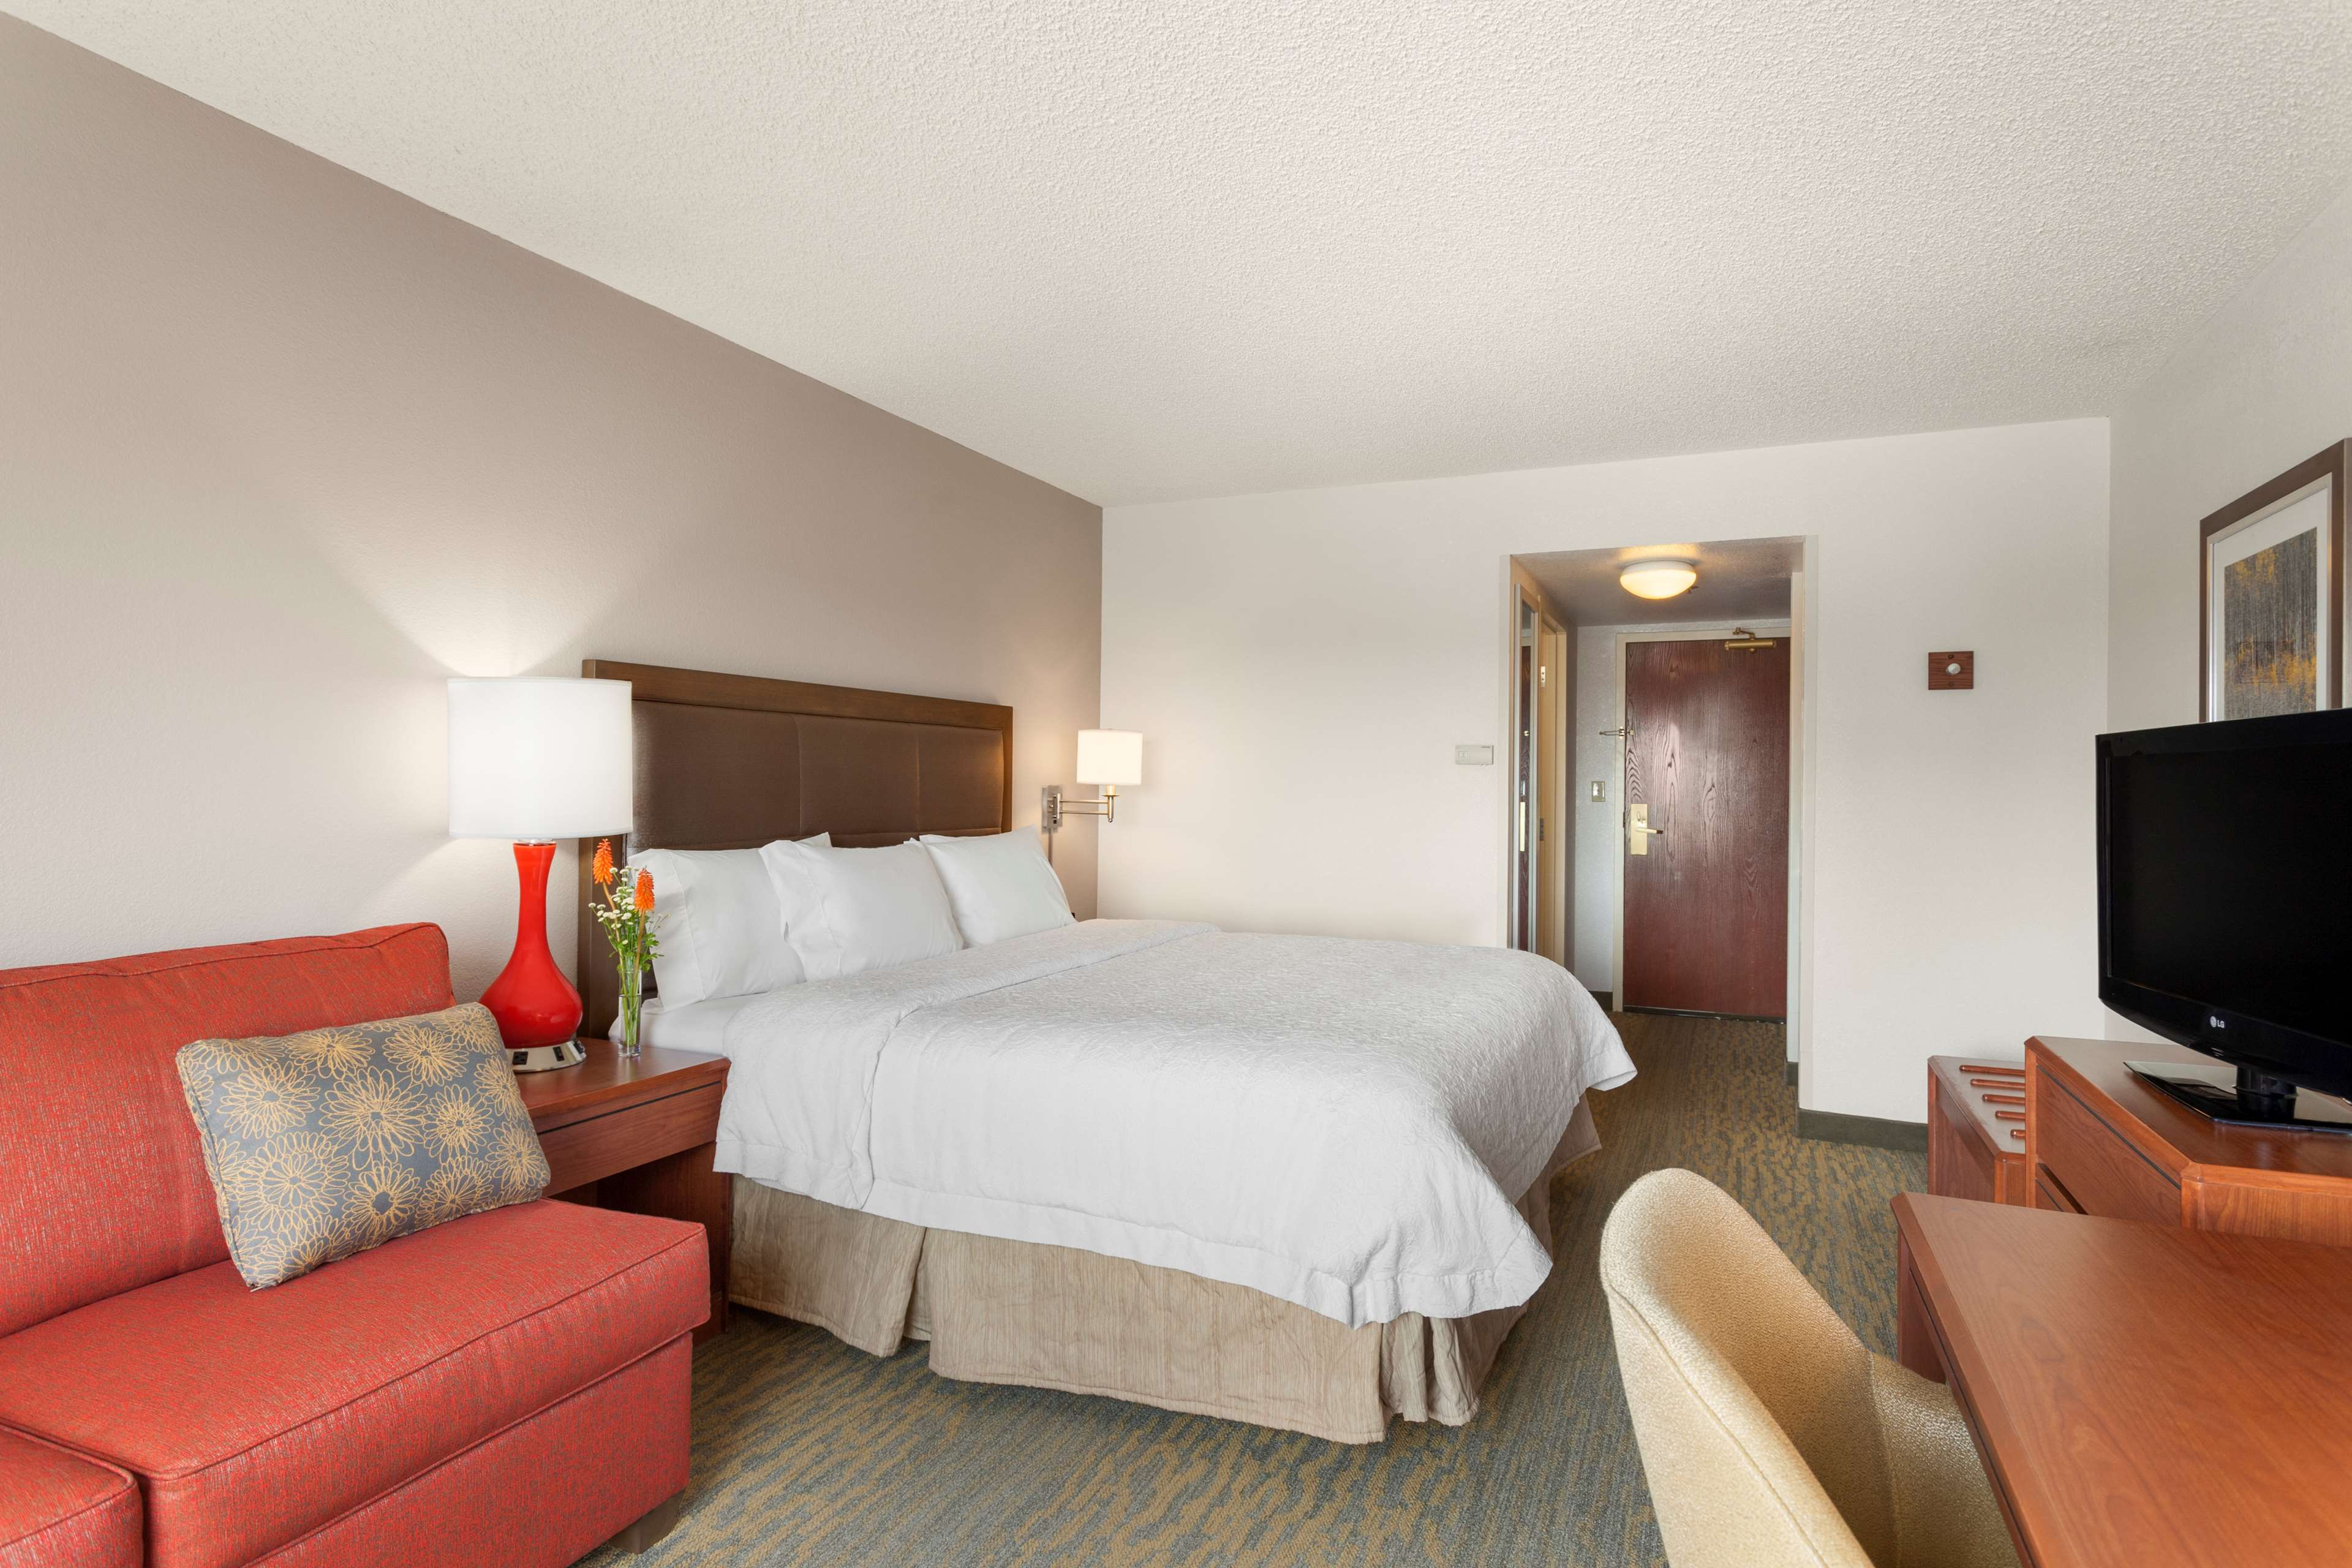 Hampton Inn & Suites Denver-Cherry Creek image 19